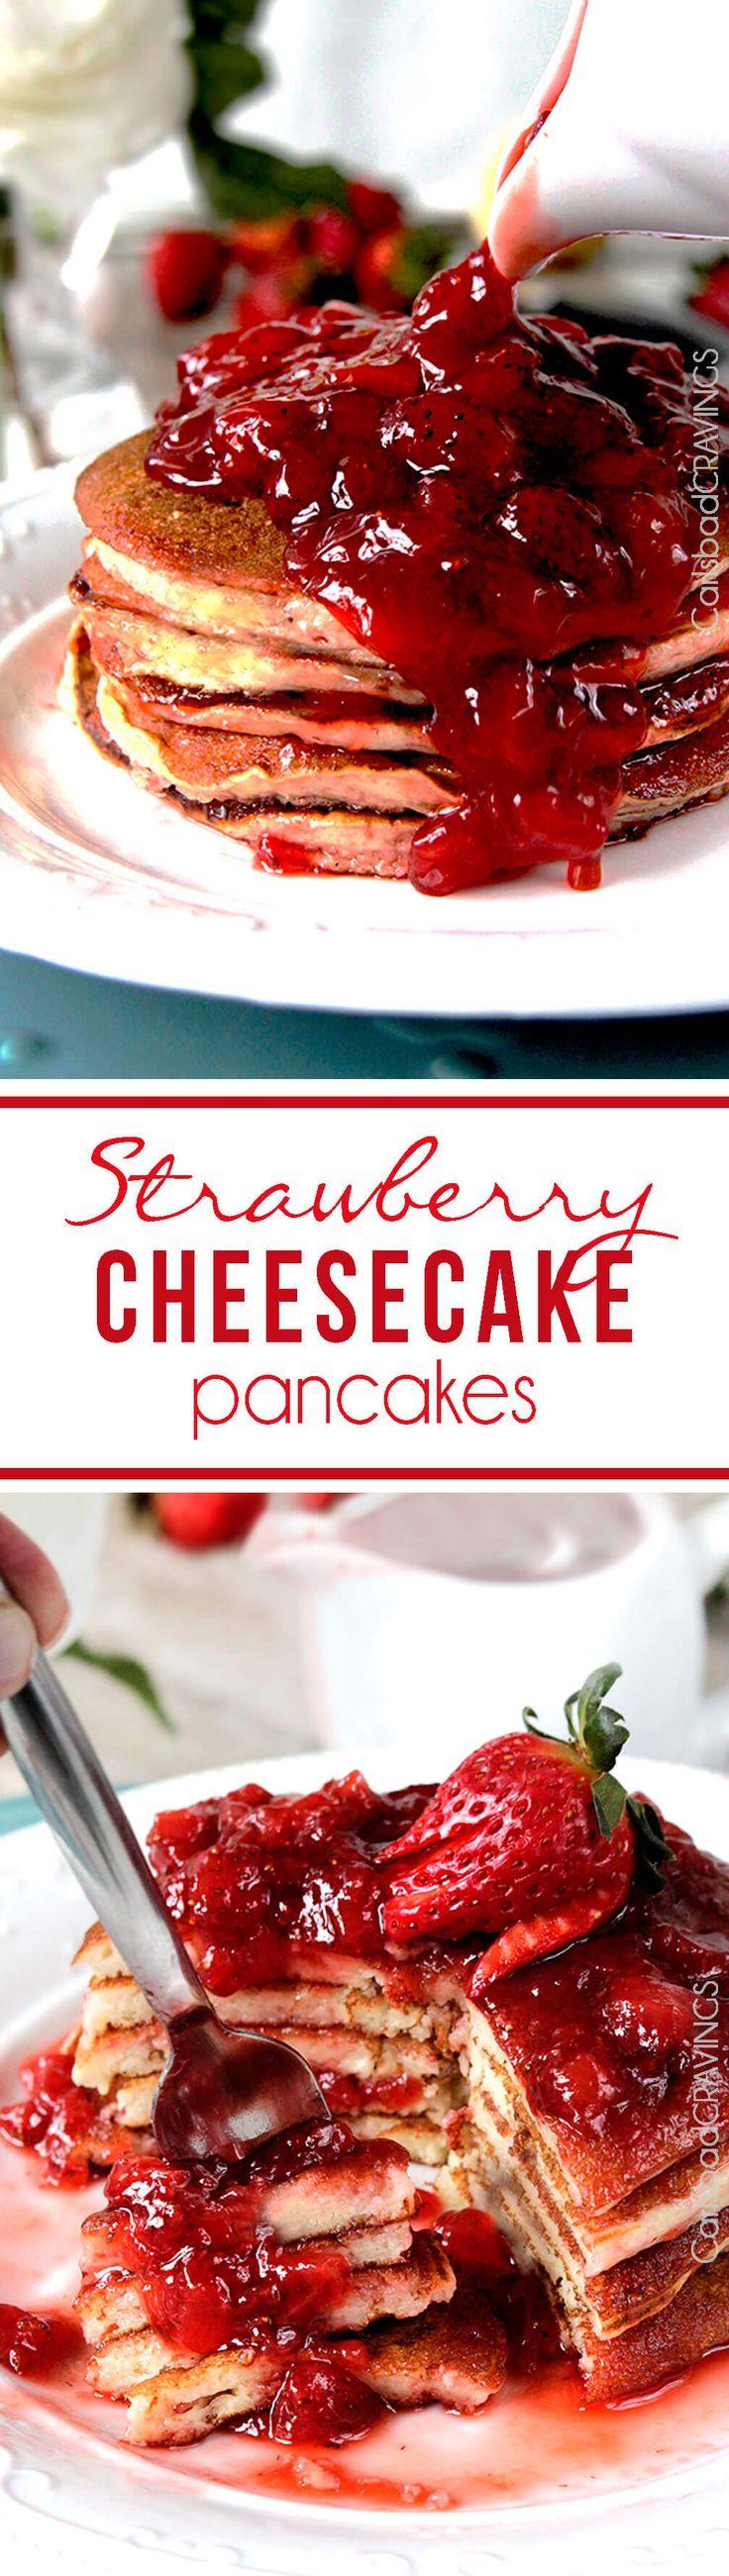 Easy Strawberry Cheesecake Pancakes = cheesecake filling + pancake dry ingredients + fresh strawberry syrup = cheesecake for breakfast! #cheesecake #pancakes #strawberry #strawberrypancakes via @carlsbadcraving